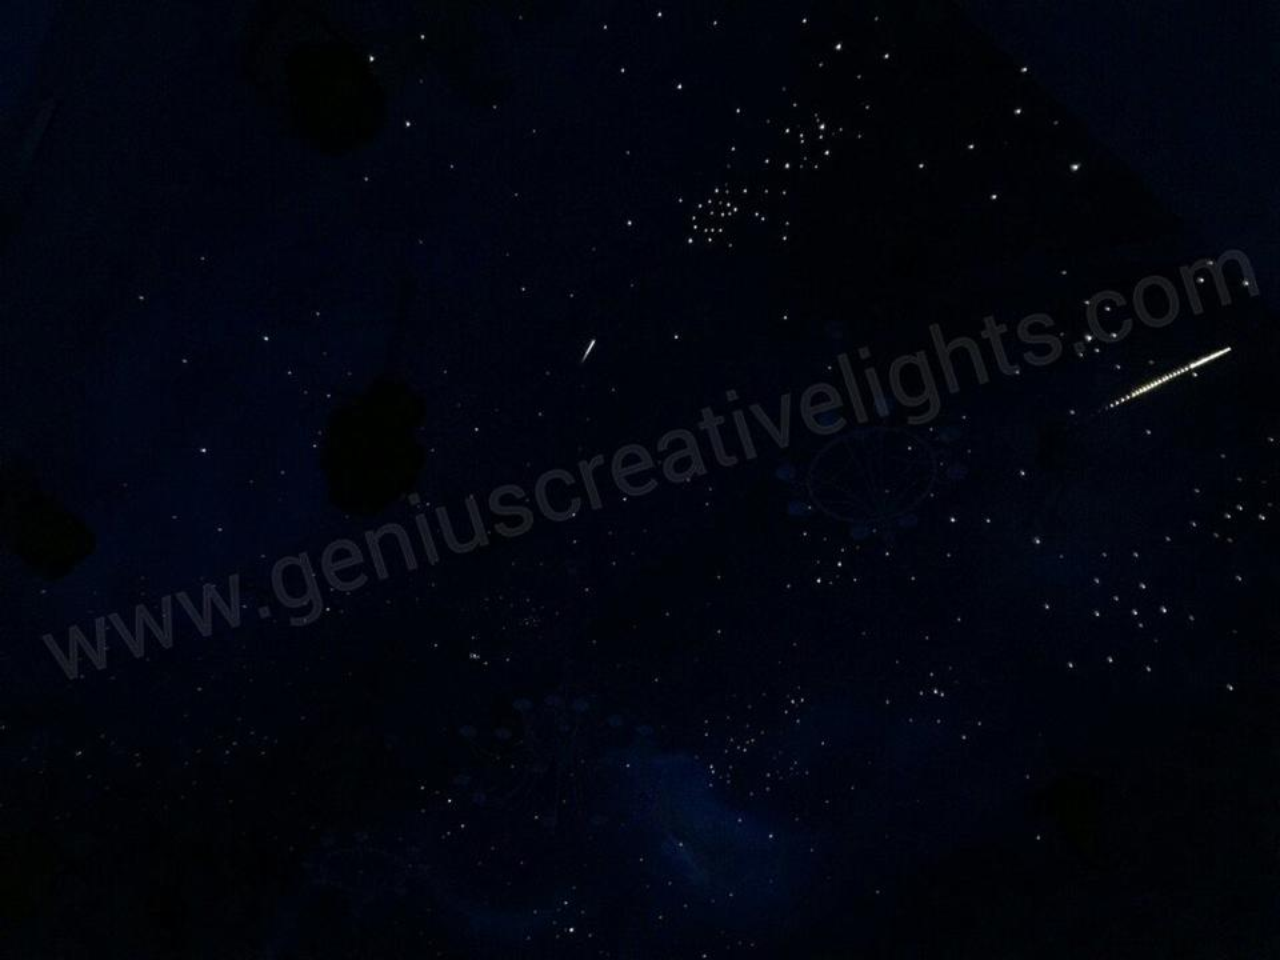 Fiber optic stars ceiling(ดาวบนฝ้าเพดาน) รูปที่ 4